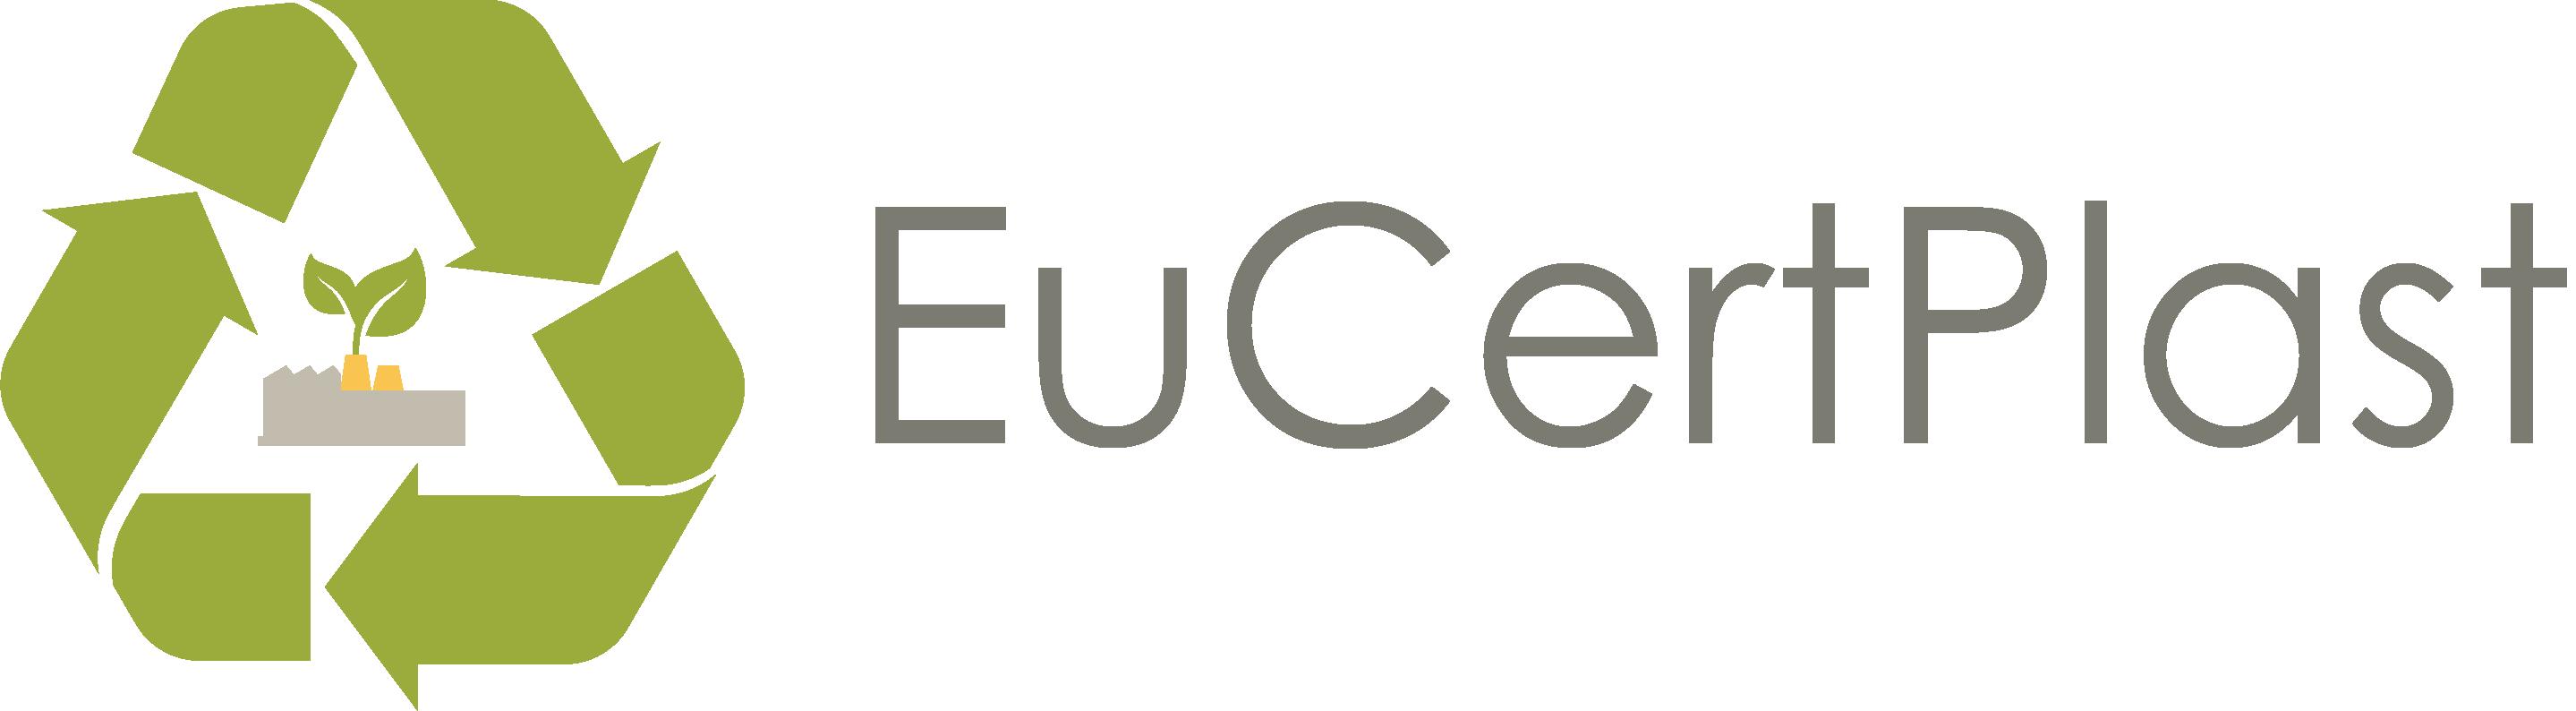 eucertplast